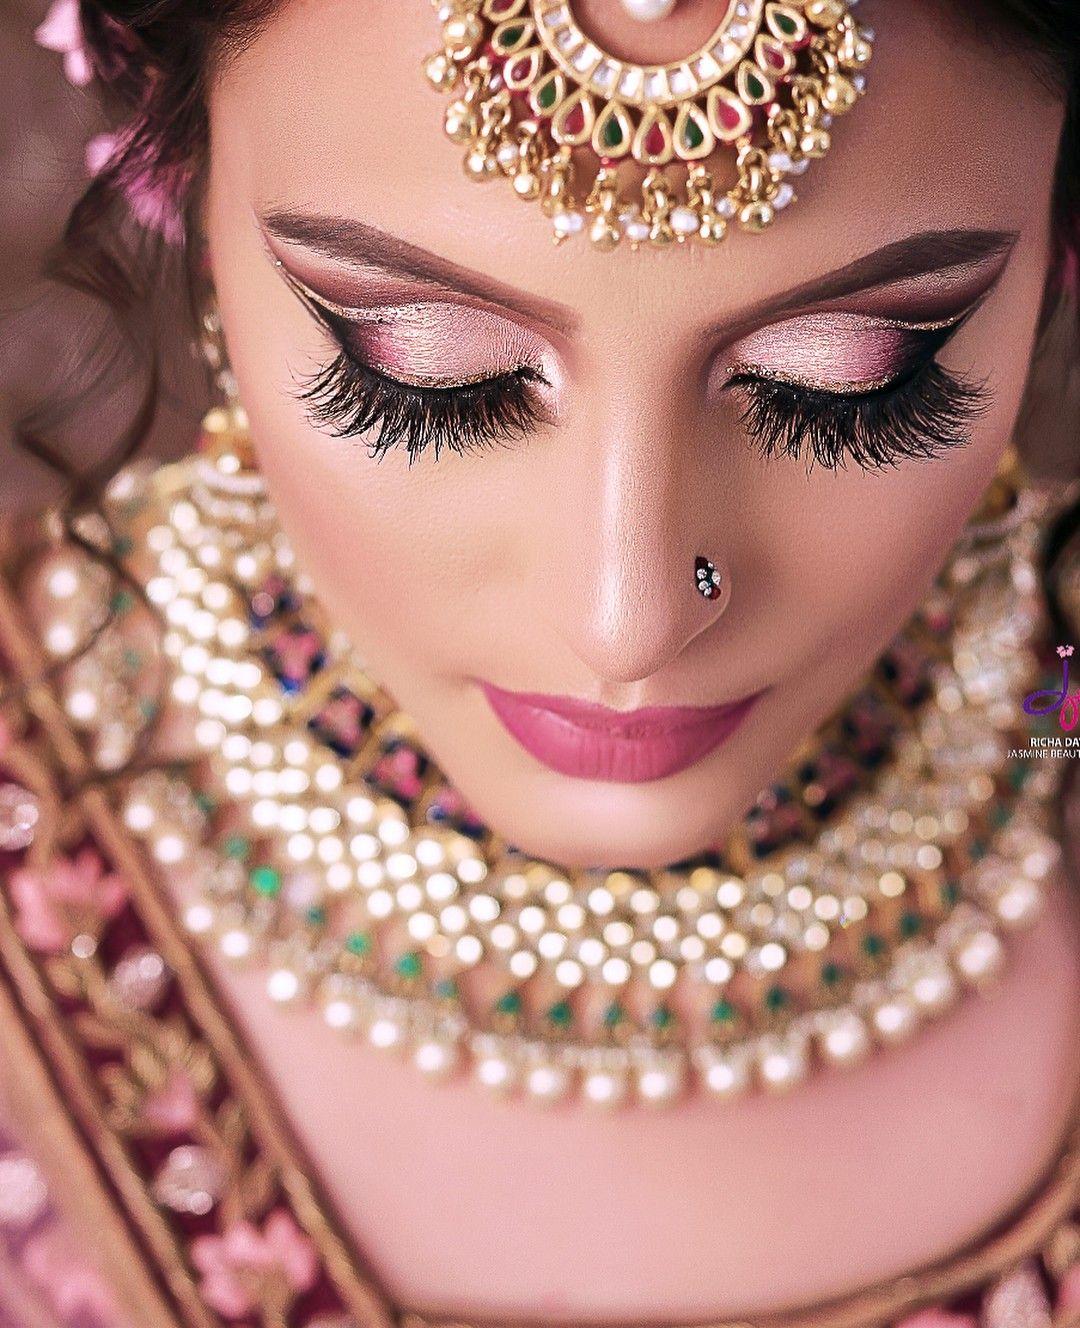 Shikachand Bridal Makeup Images Indian Wedding Makeup Bridal